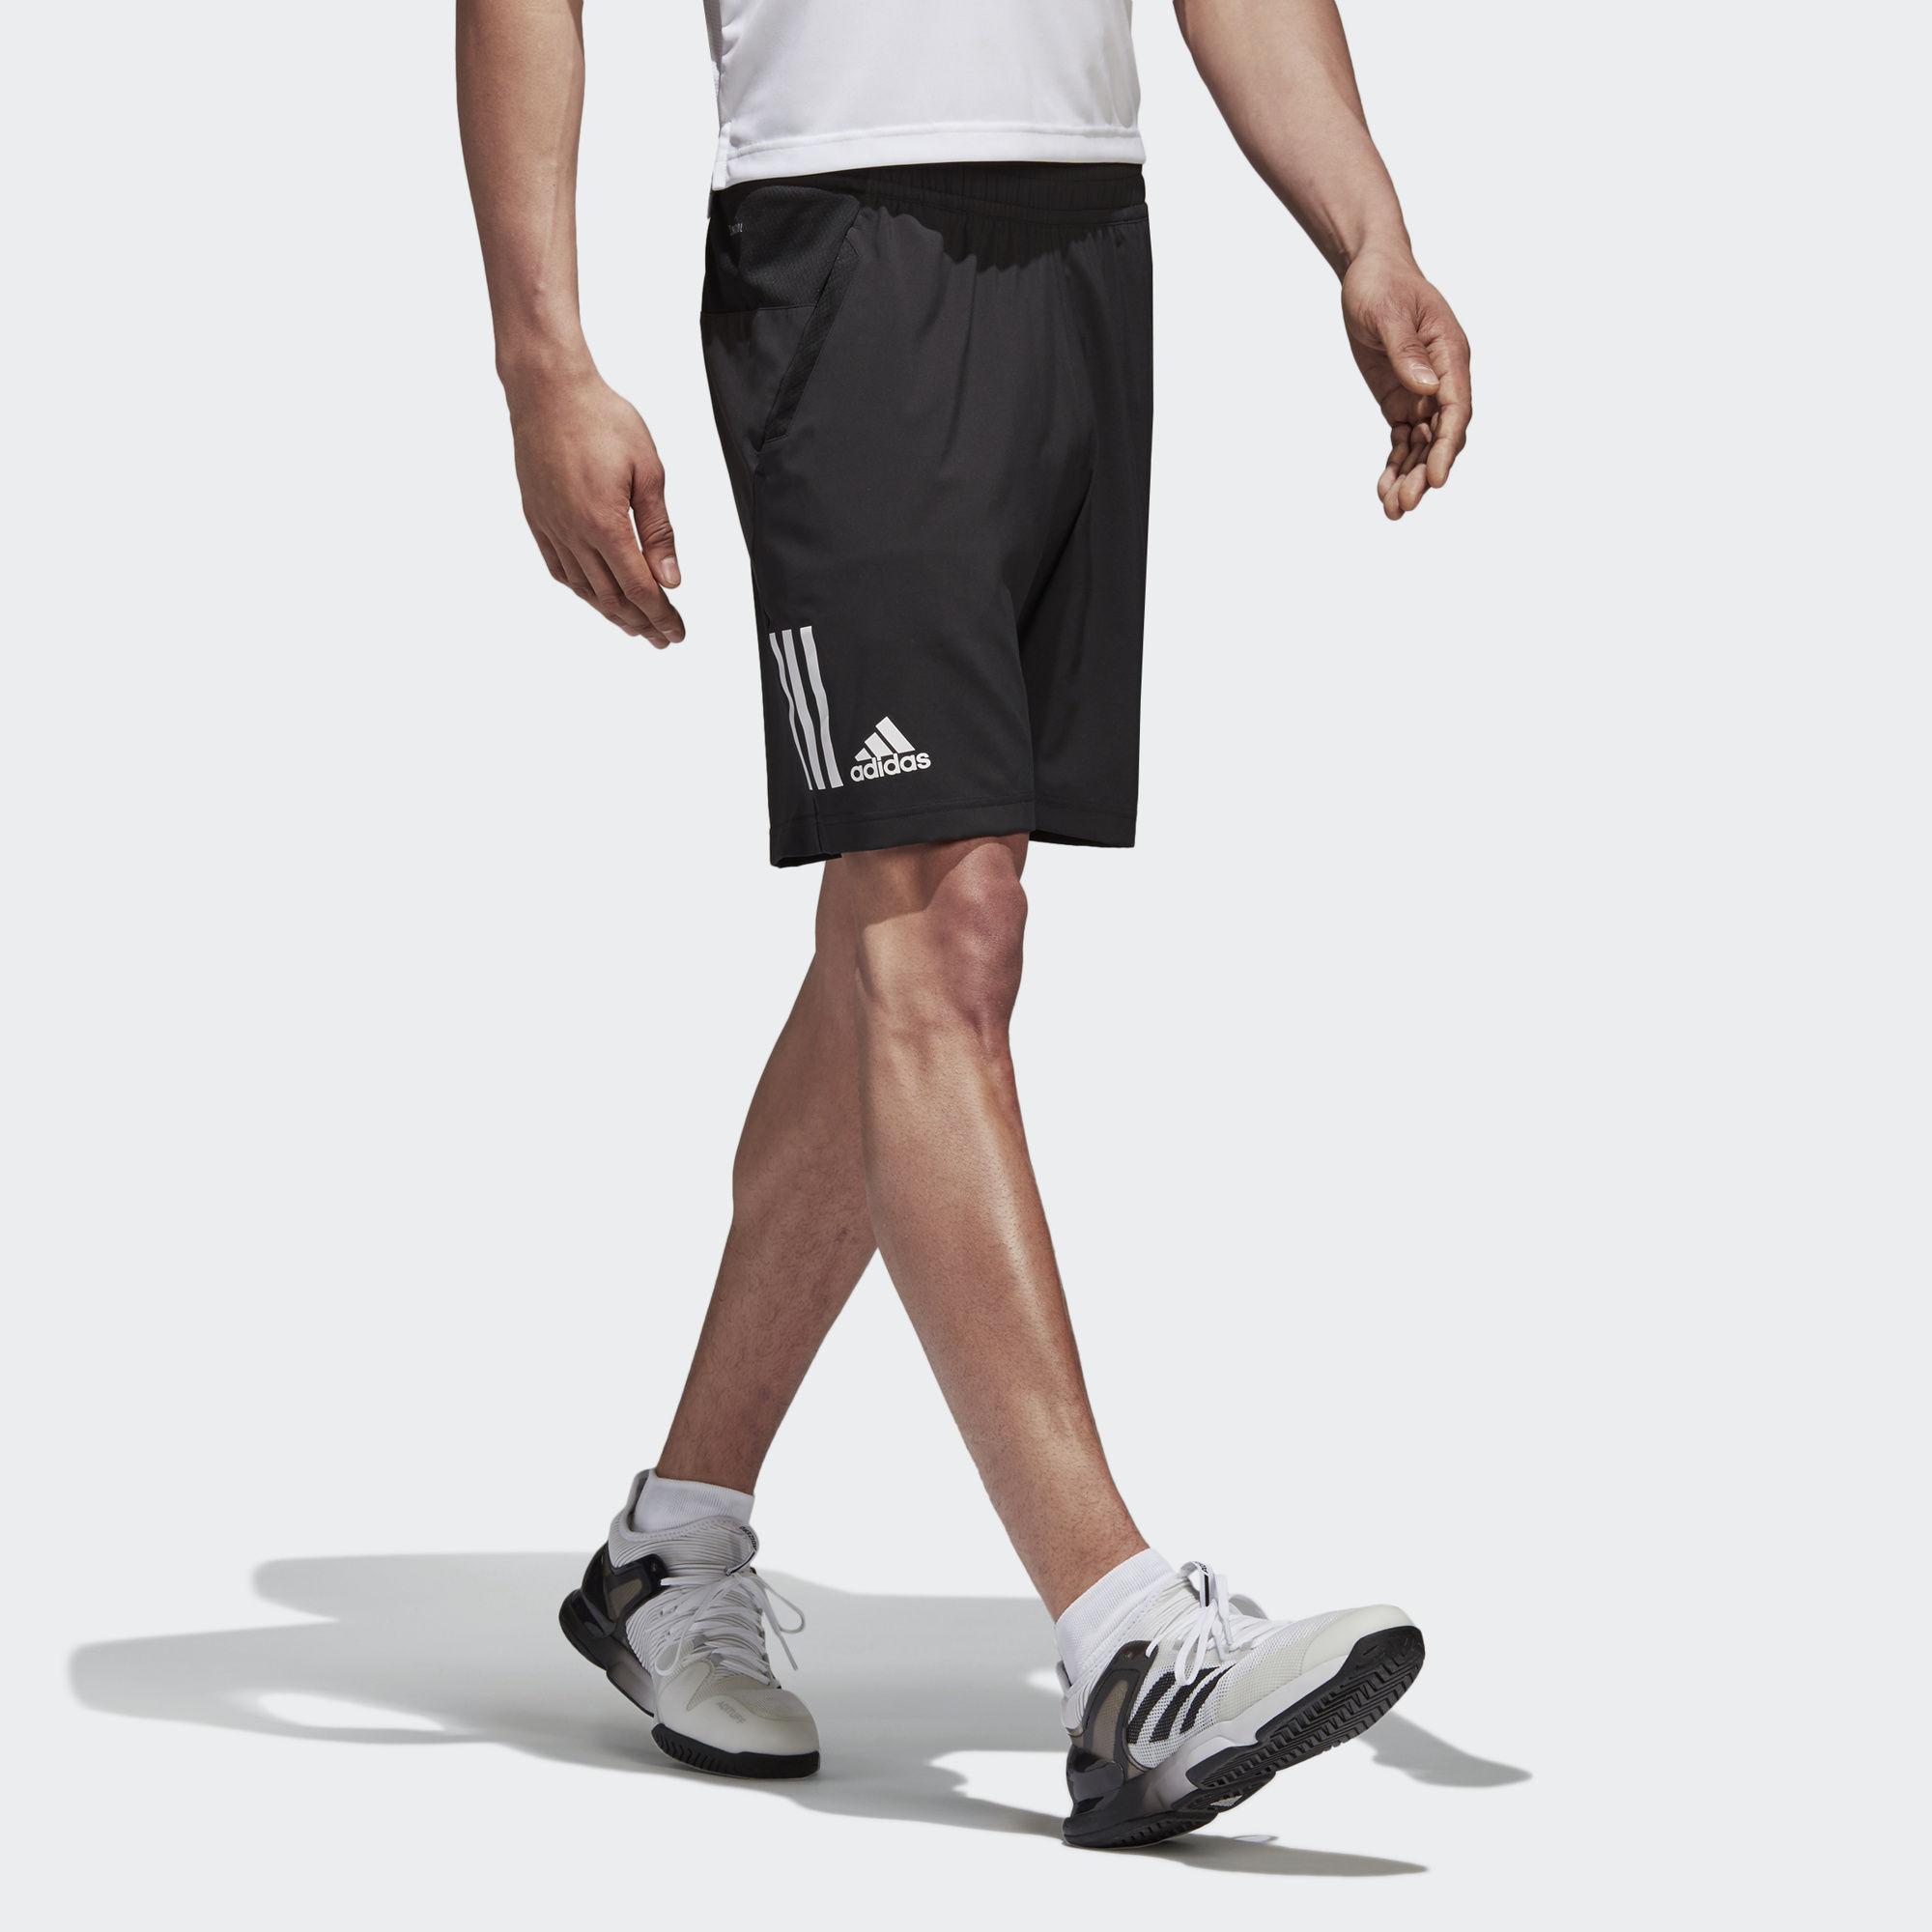 0a8da37a0fb Adidas Mens Club Tennis Shorts - Black - Tennisnuts.com